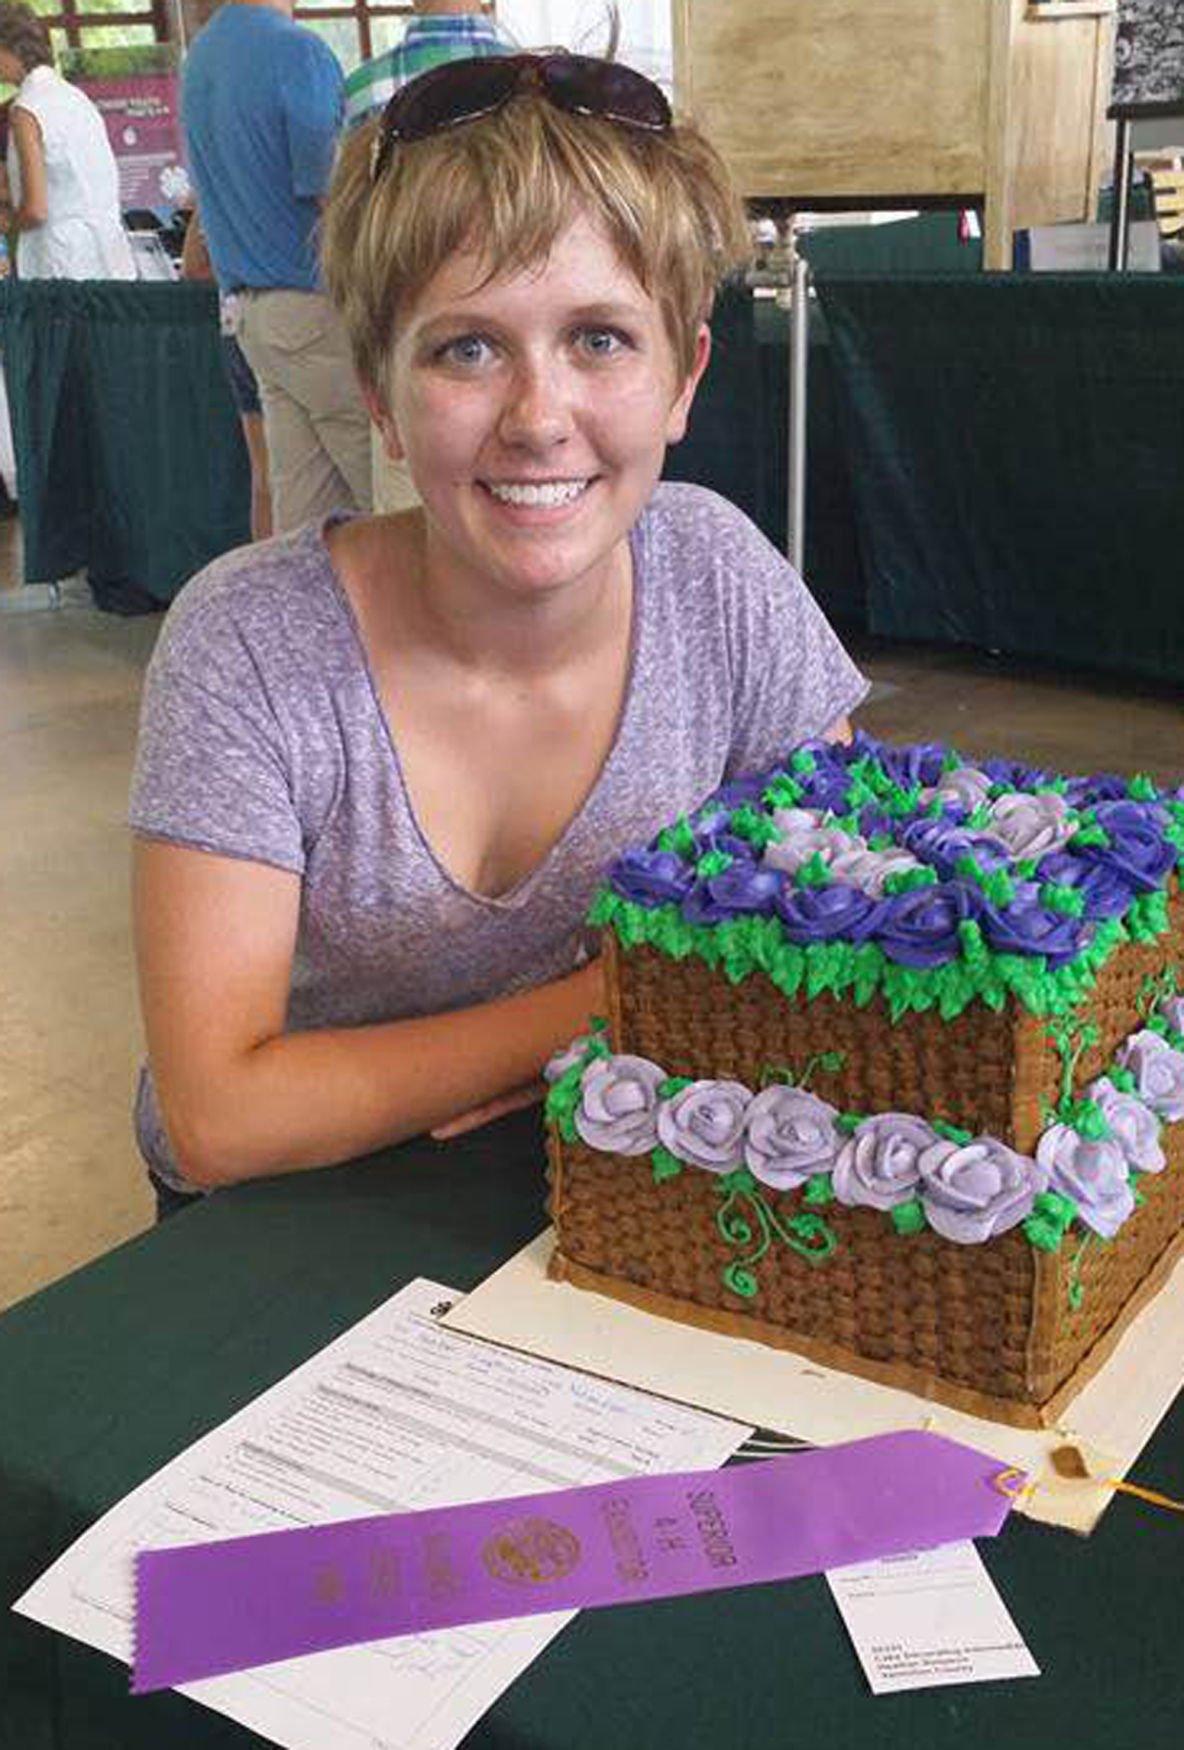 Illinois vermilion county fairmount - Vermilion County 4 H At The Illinois State Fair